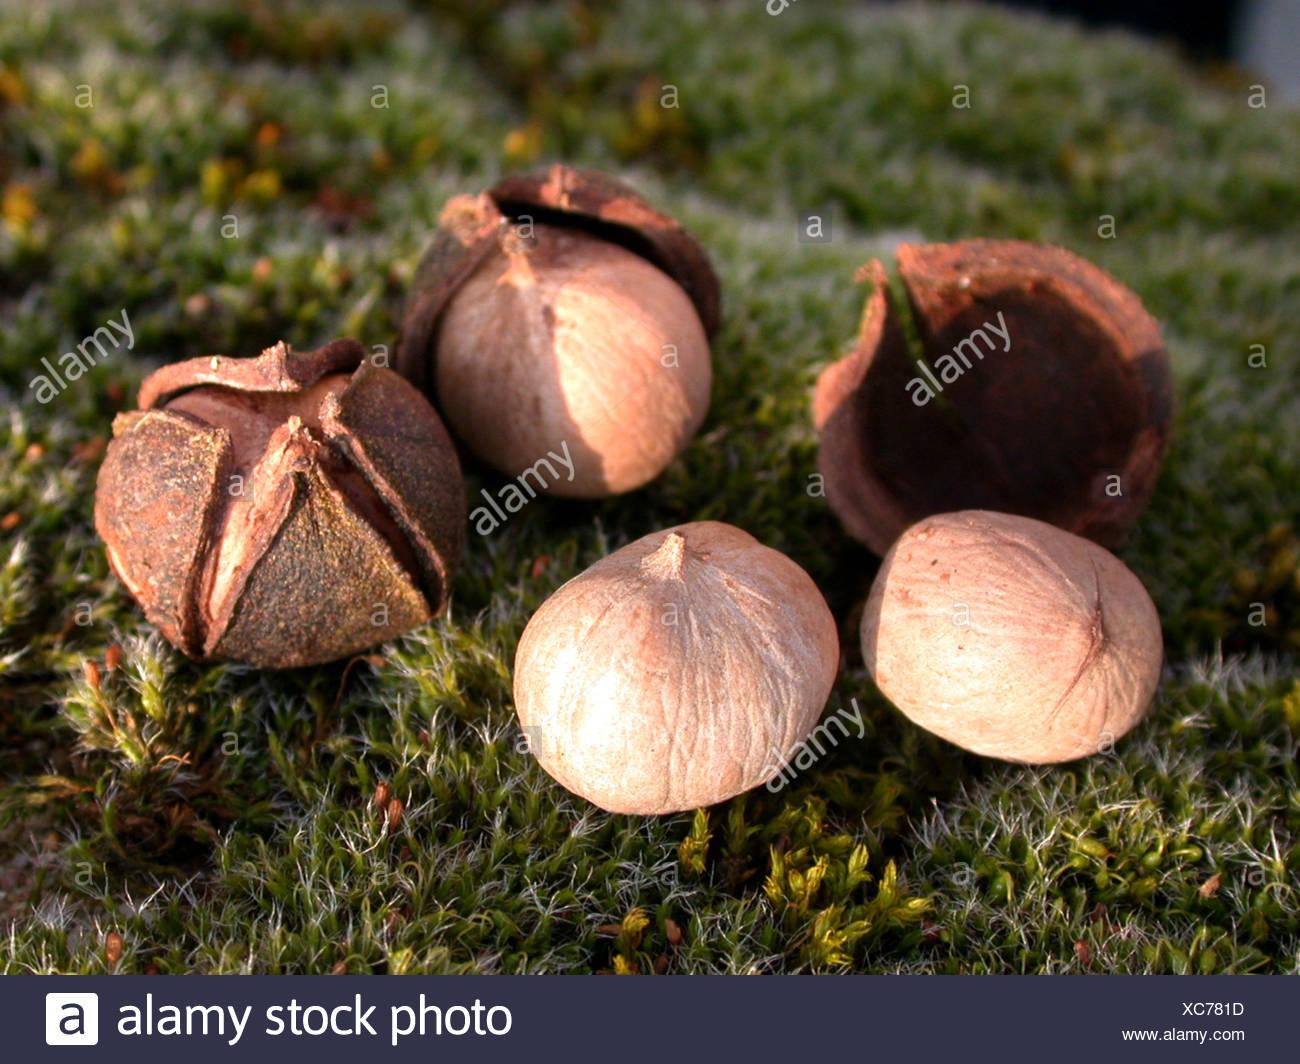 bitter-nut hickory, bitternut hockory (Carya cordiformis), Nuts with husks Stock Photo